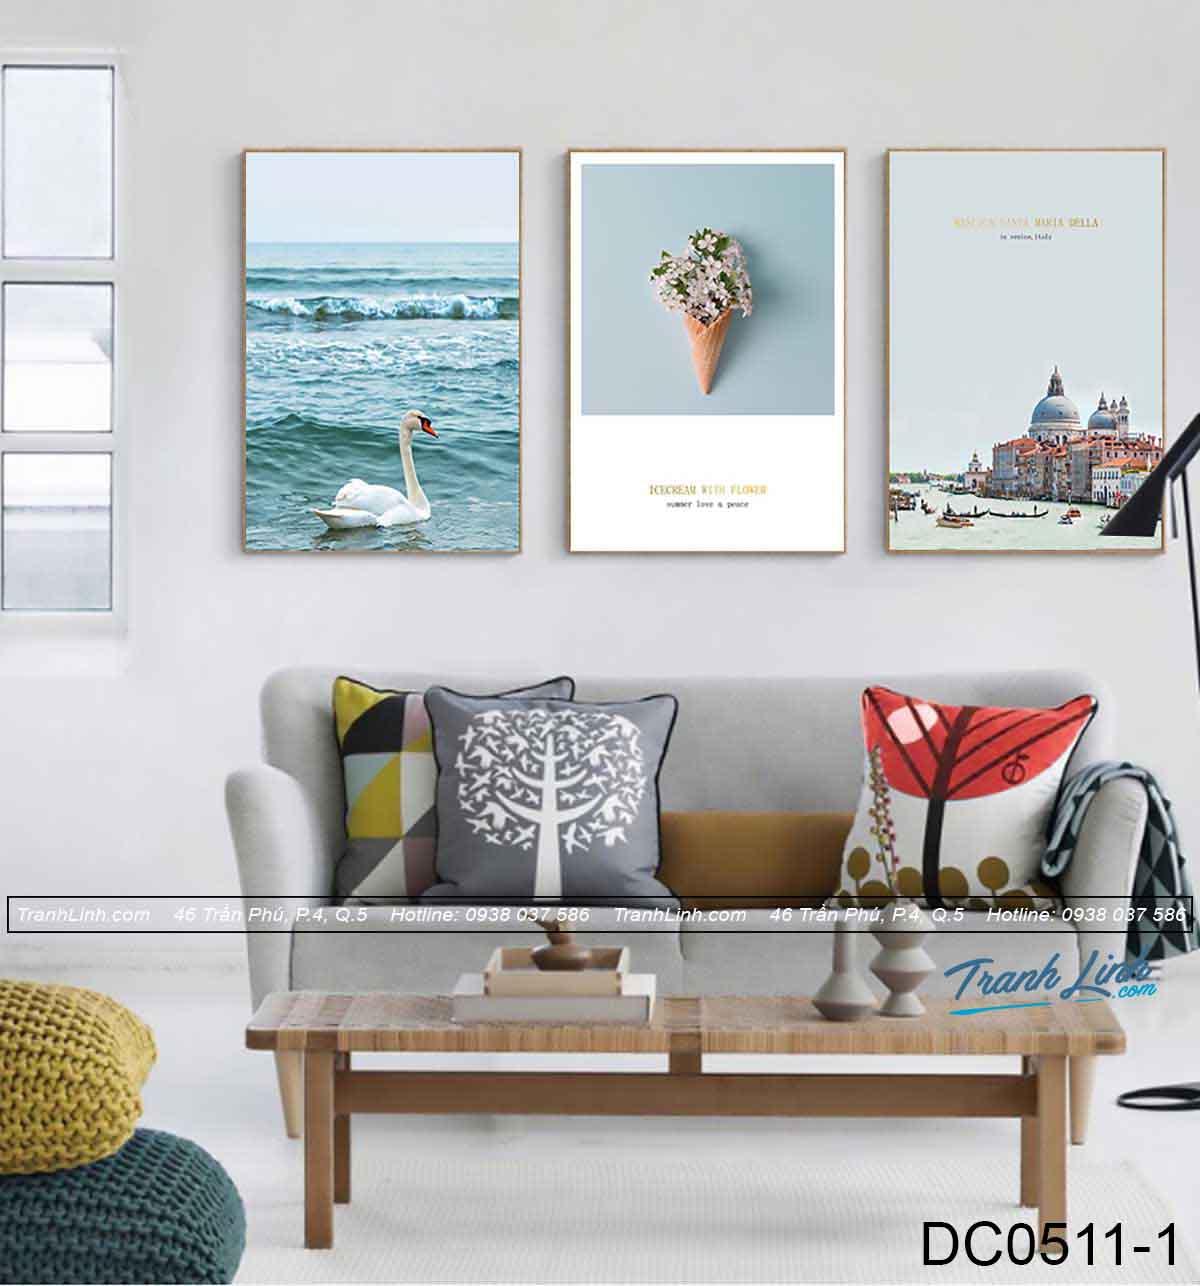 bo-tranh-canvas-trang-tri-decor-dc0511.jpg